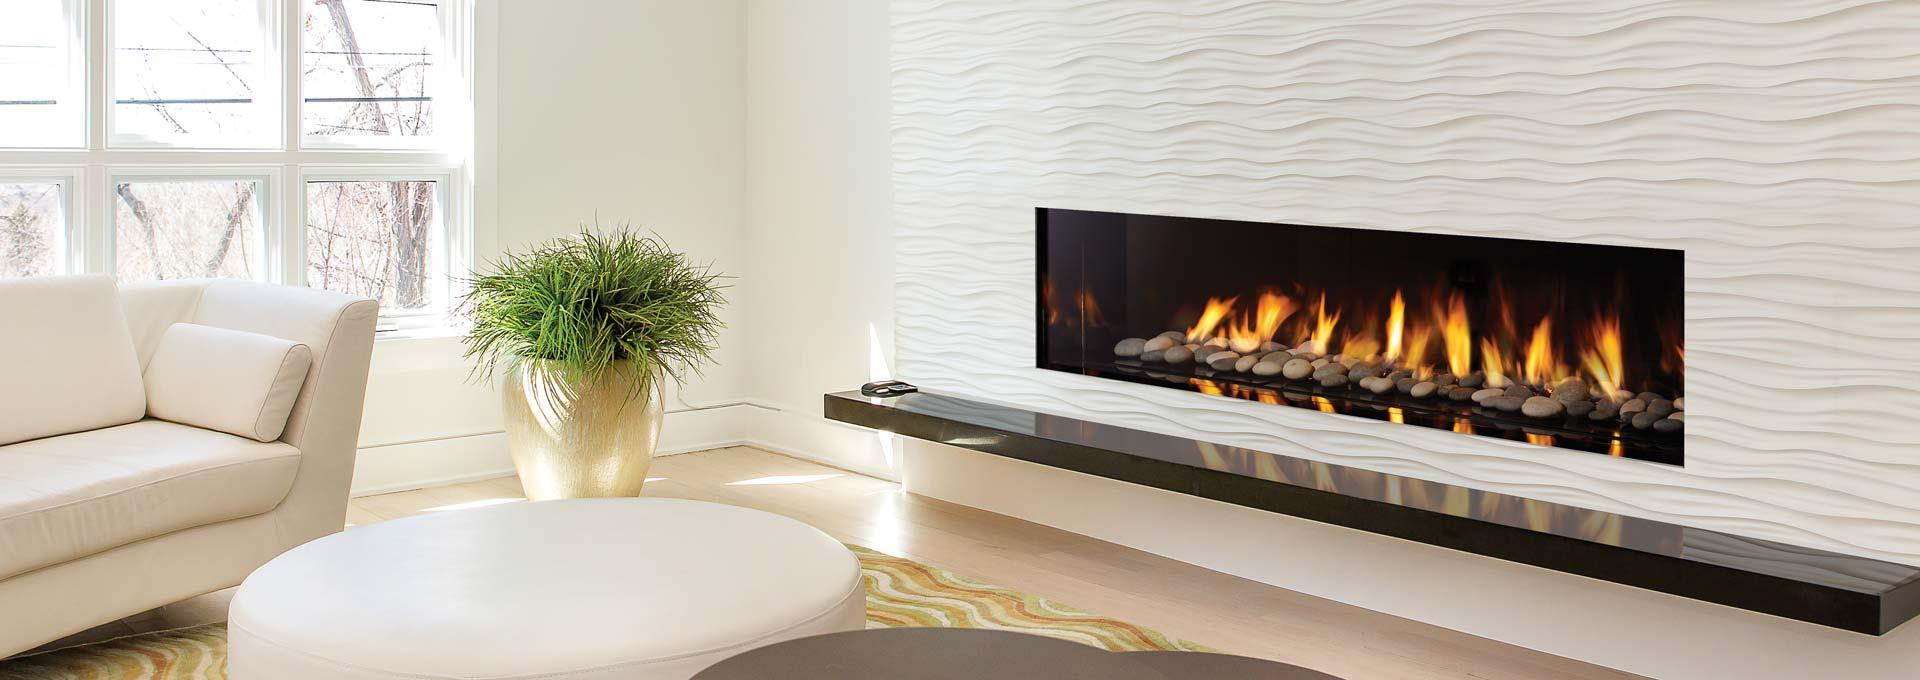 Regency City Series New York View 72 Modern Gas Fireplace